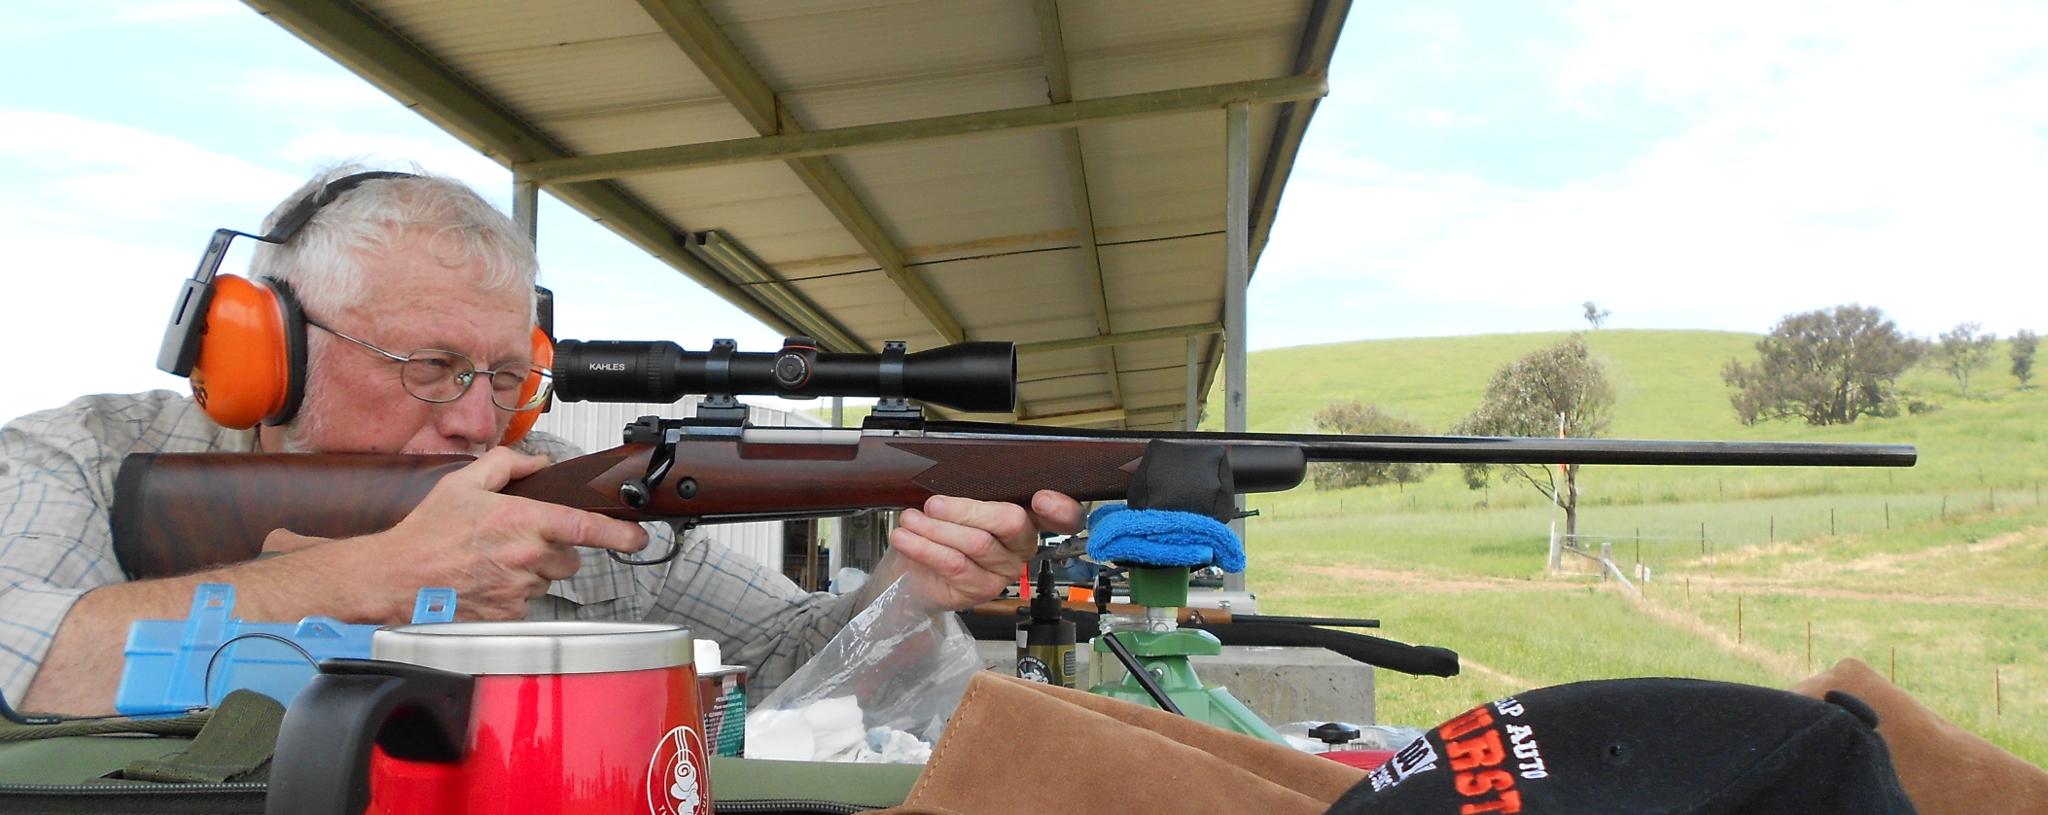 Winchester M70 rifle benchrest sighting in